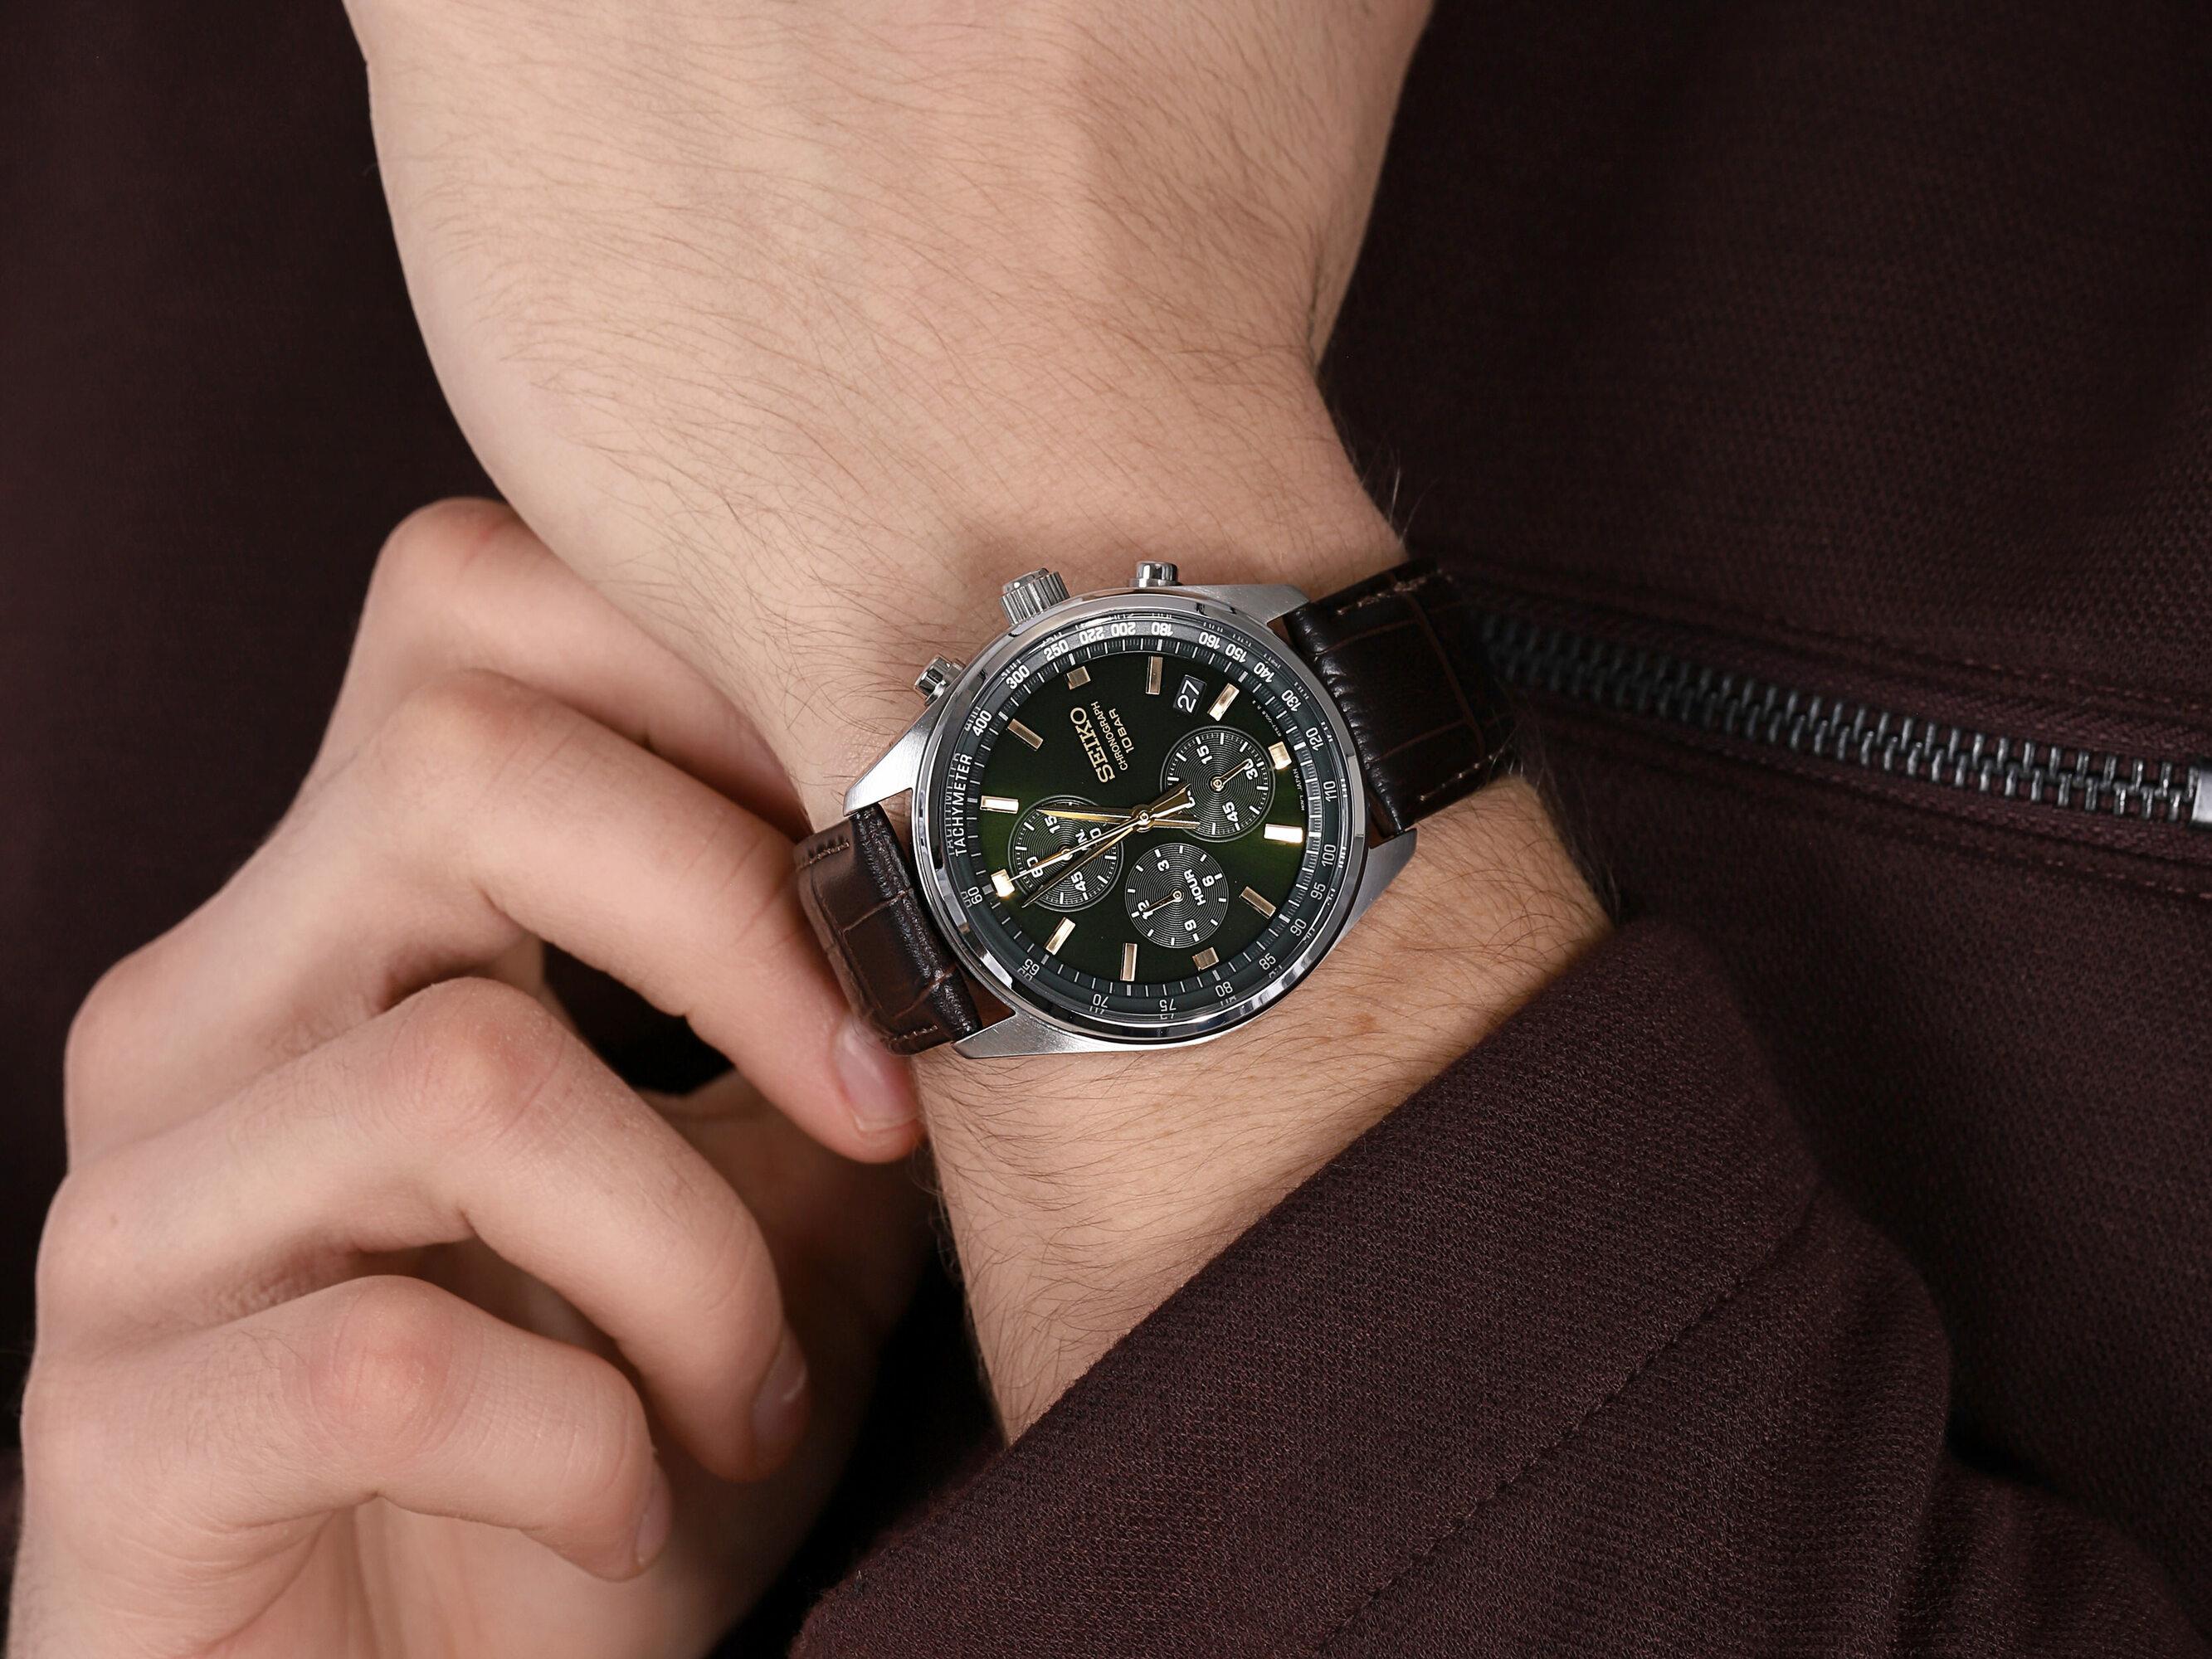 zegarek Seiko SSB385P1 Chronograph Quartz 100m męski z tachometr Chronograph